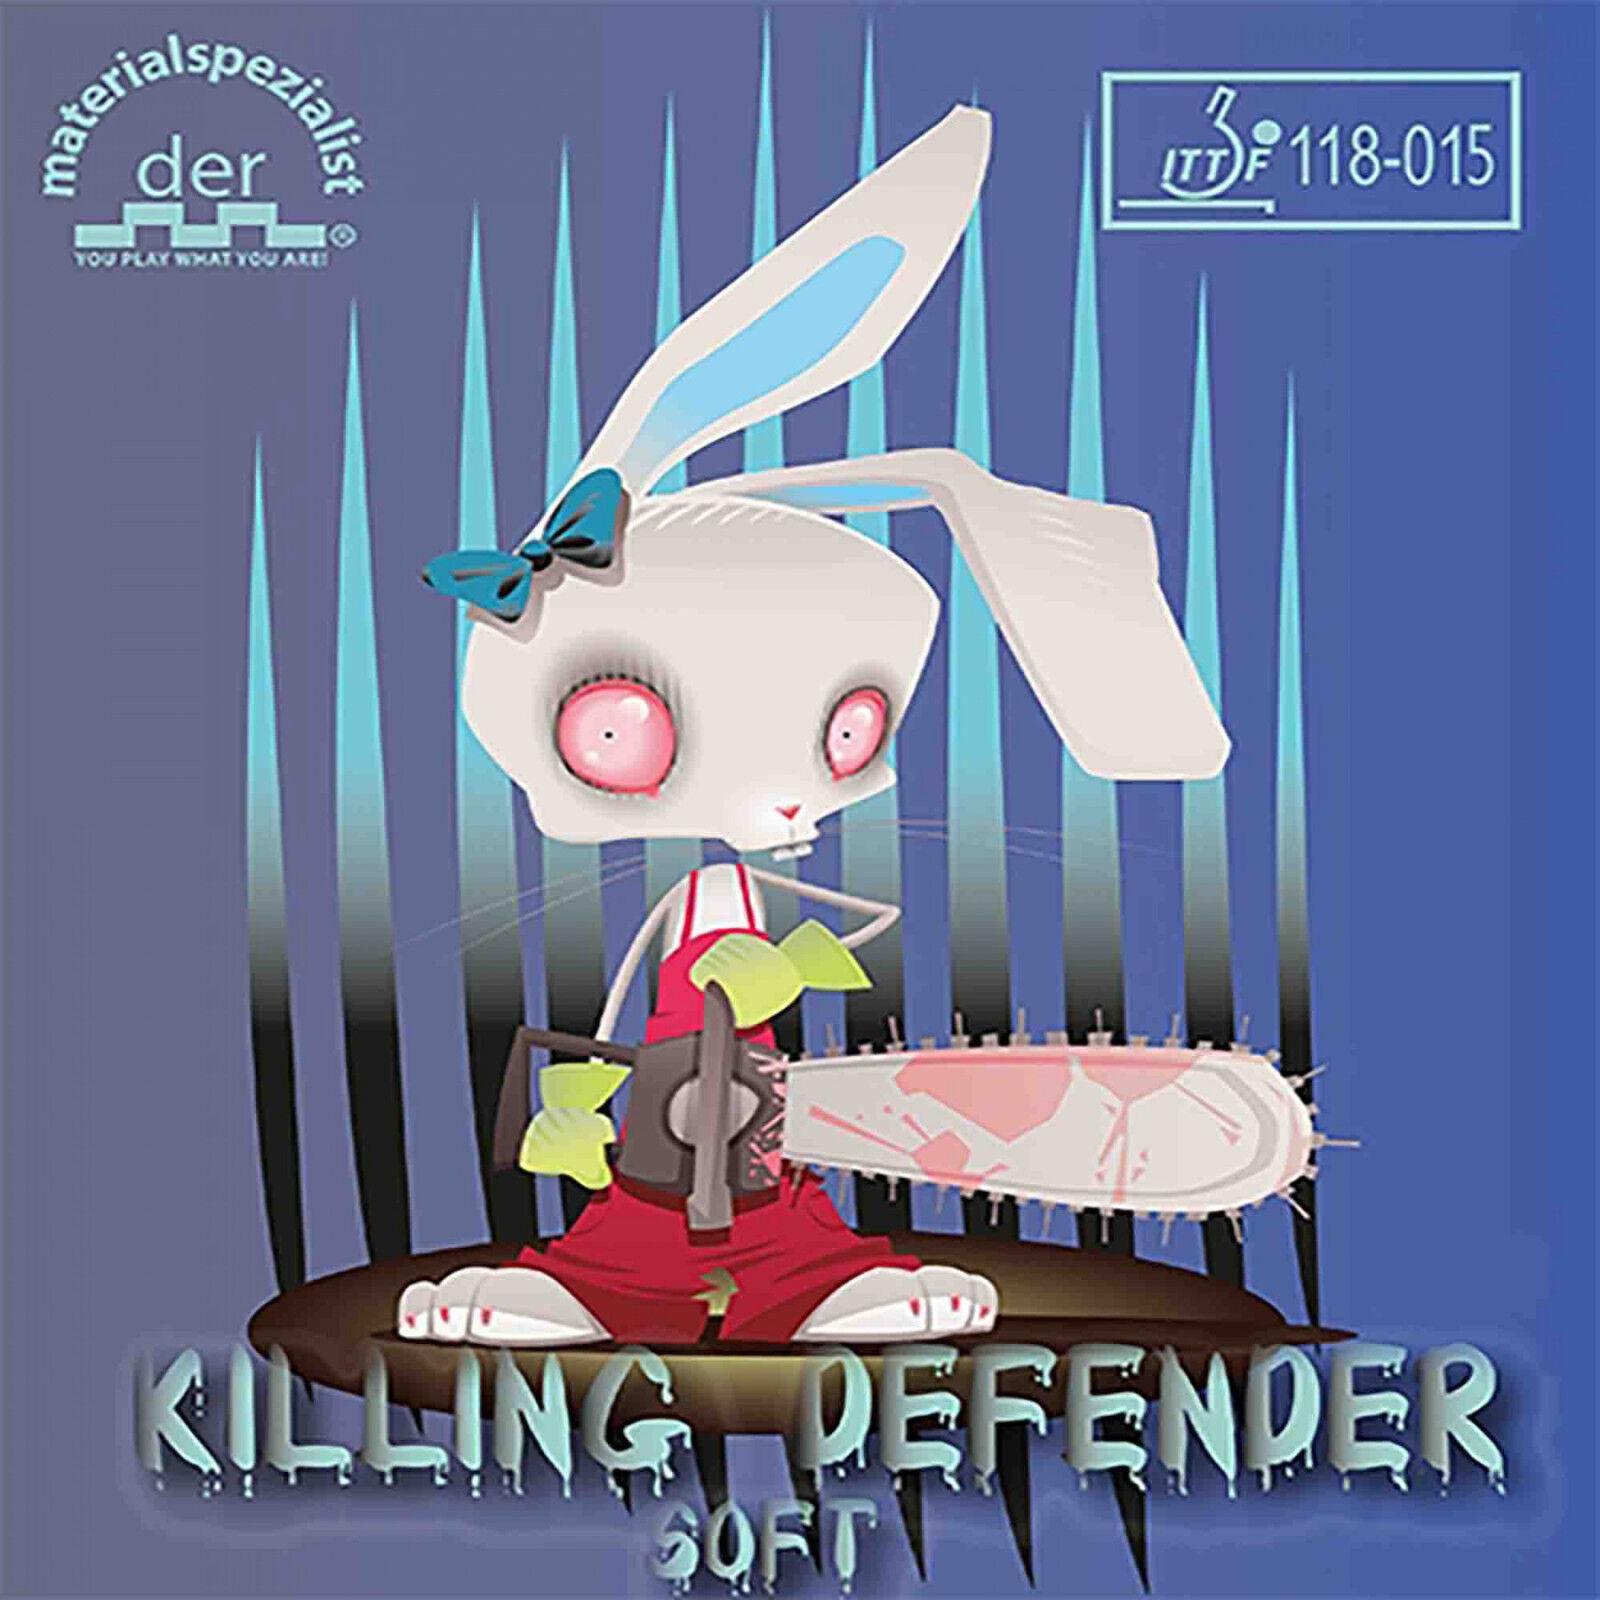 Der Materialspezialist Killing Defender Soft 1,0 1,3 1,6 1,6 1,6 mm a2ff1e